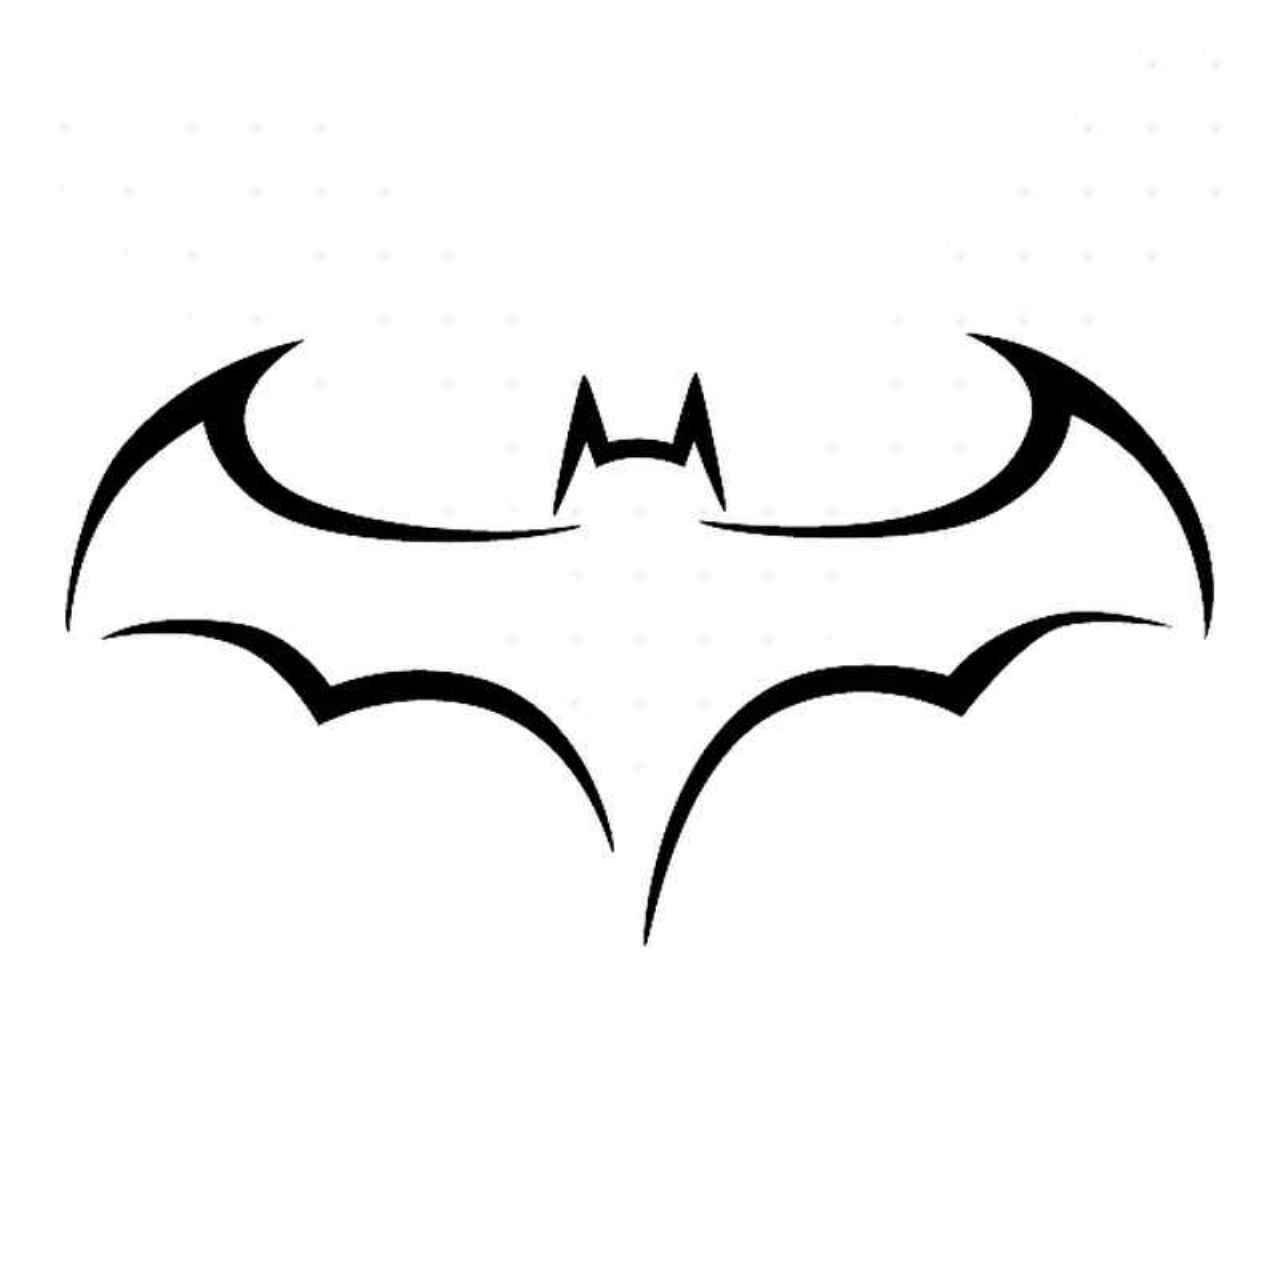 07594b75e How to Draw Batman Logo - Tribal Tattoo Design Style - YouTube   Tattoos in  2019   Beginner tattoos, Batman drawing, Tattoo design drawings